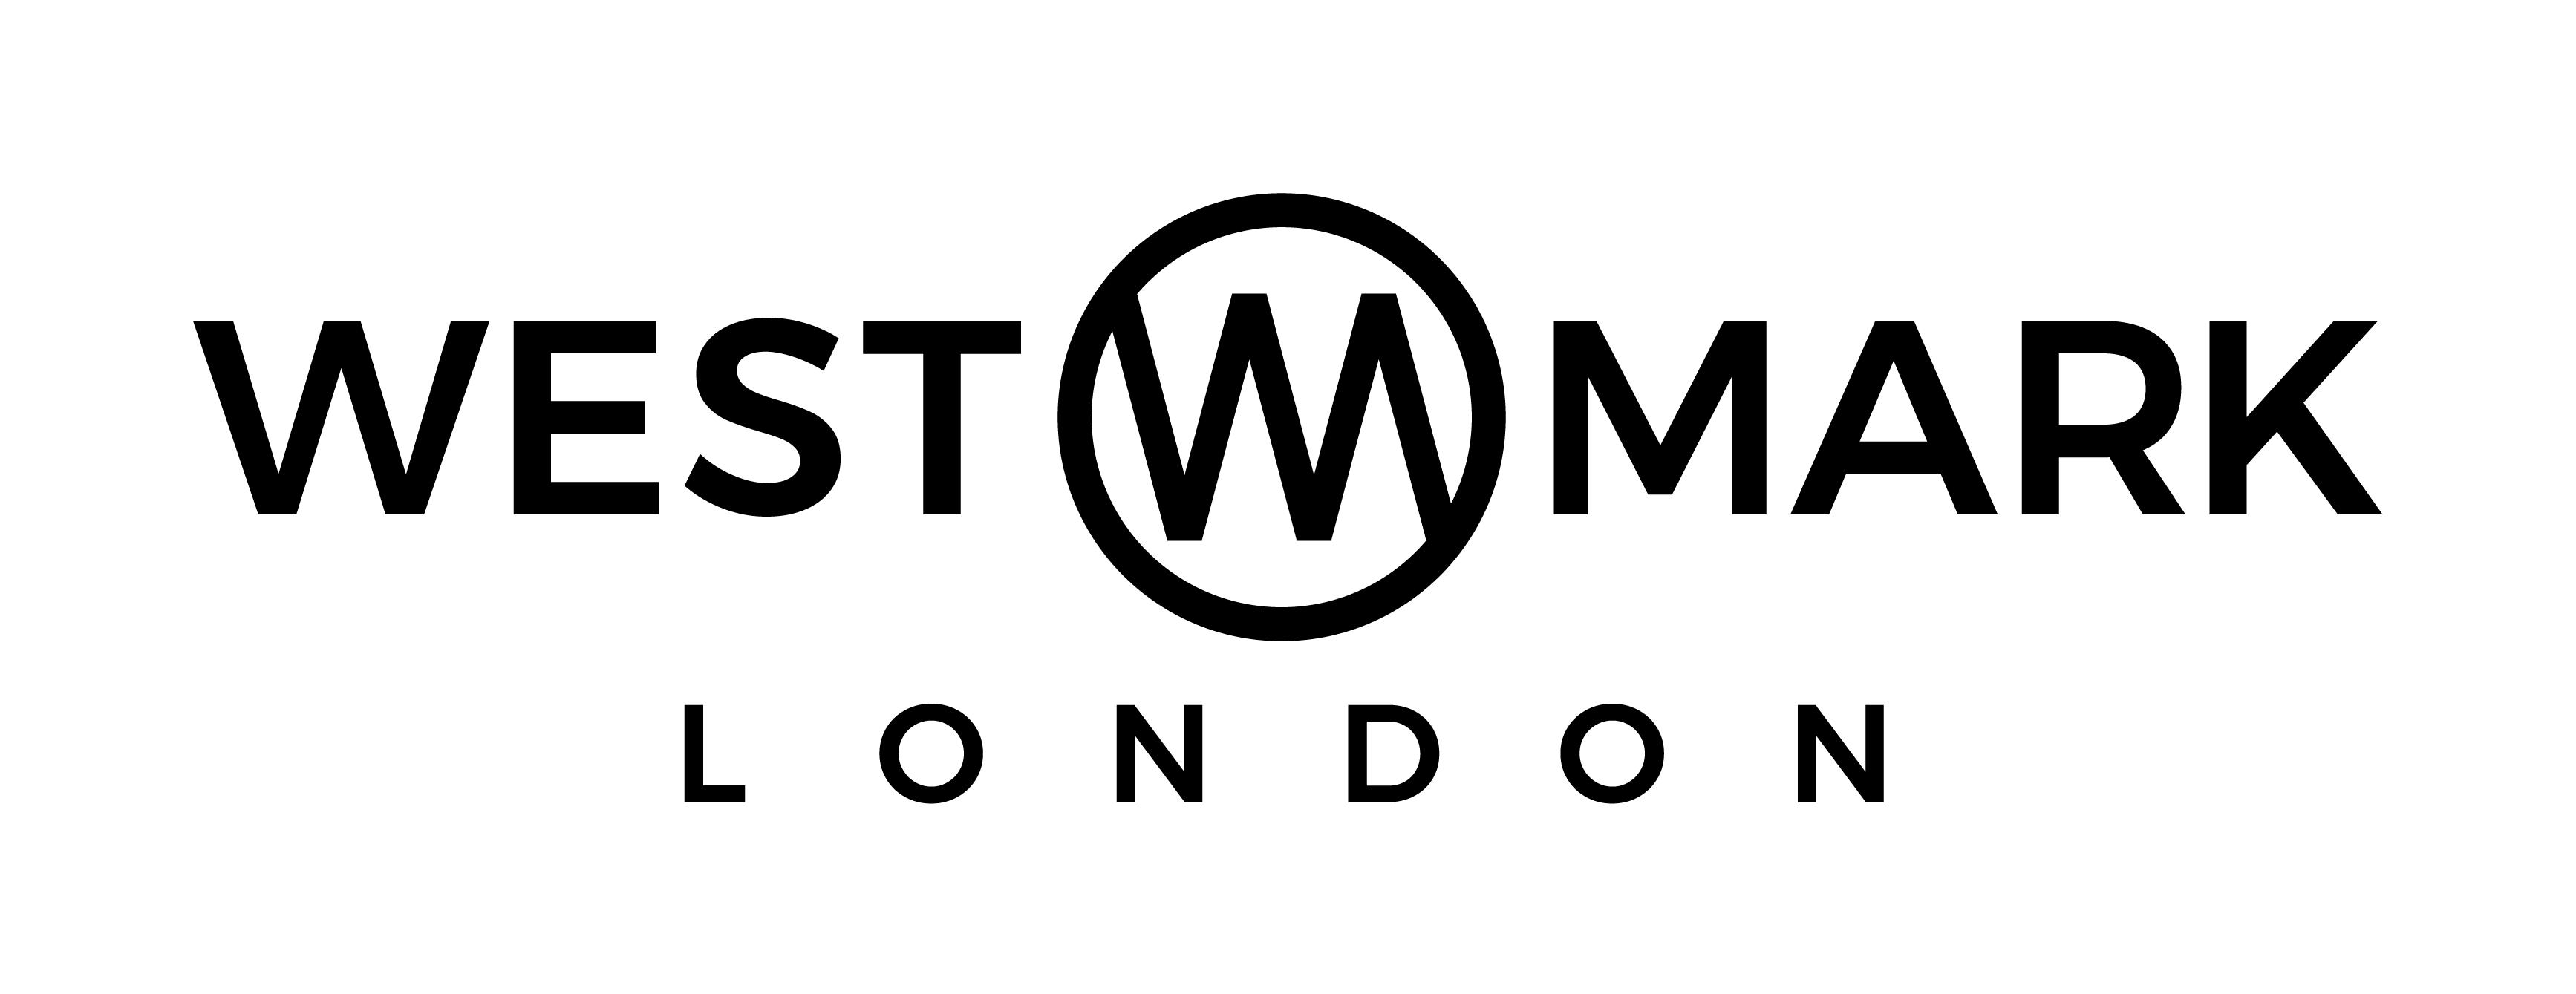 Westmark London